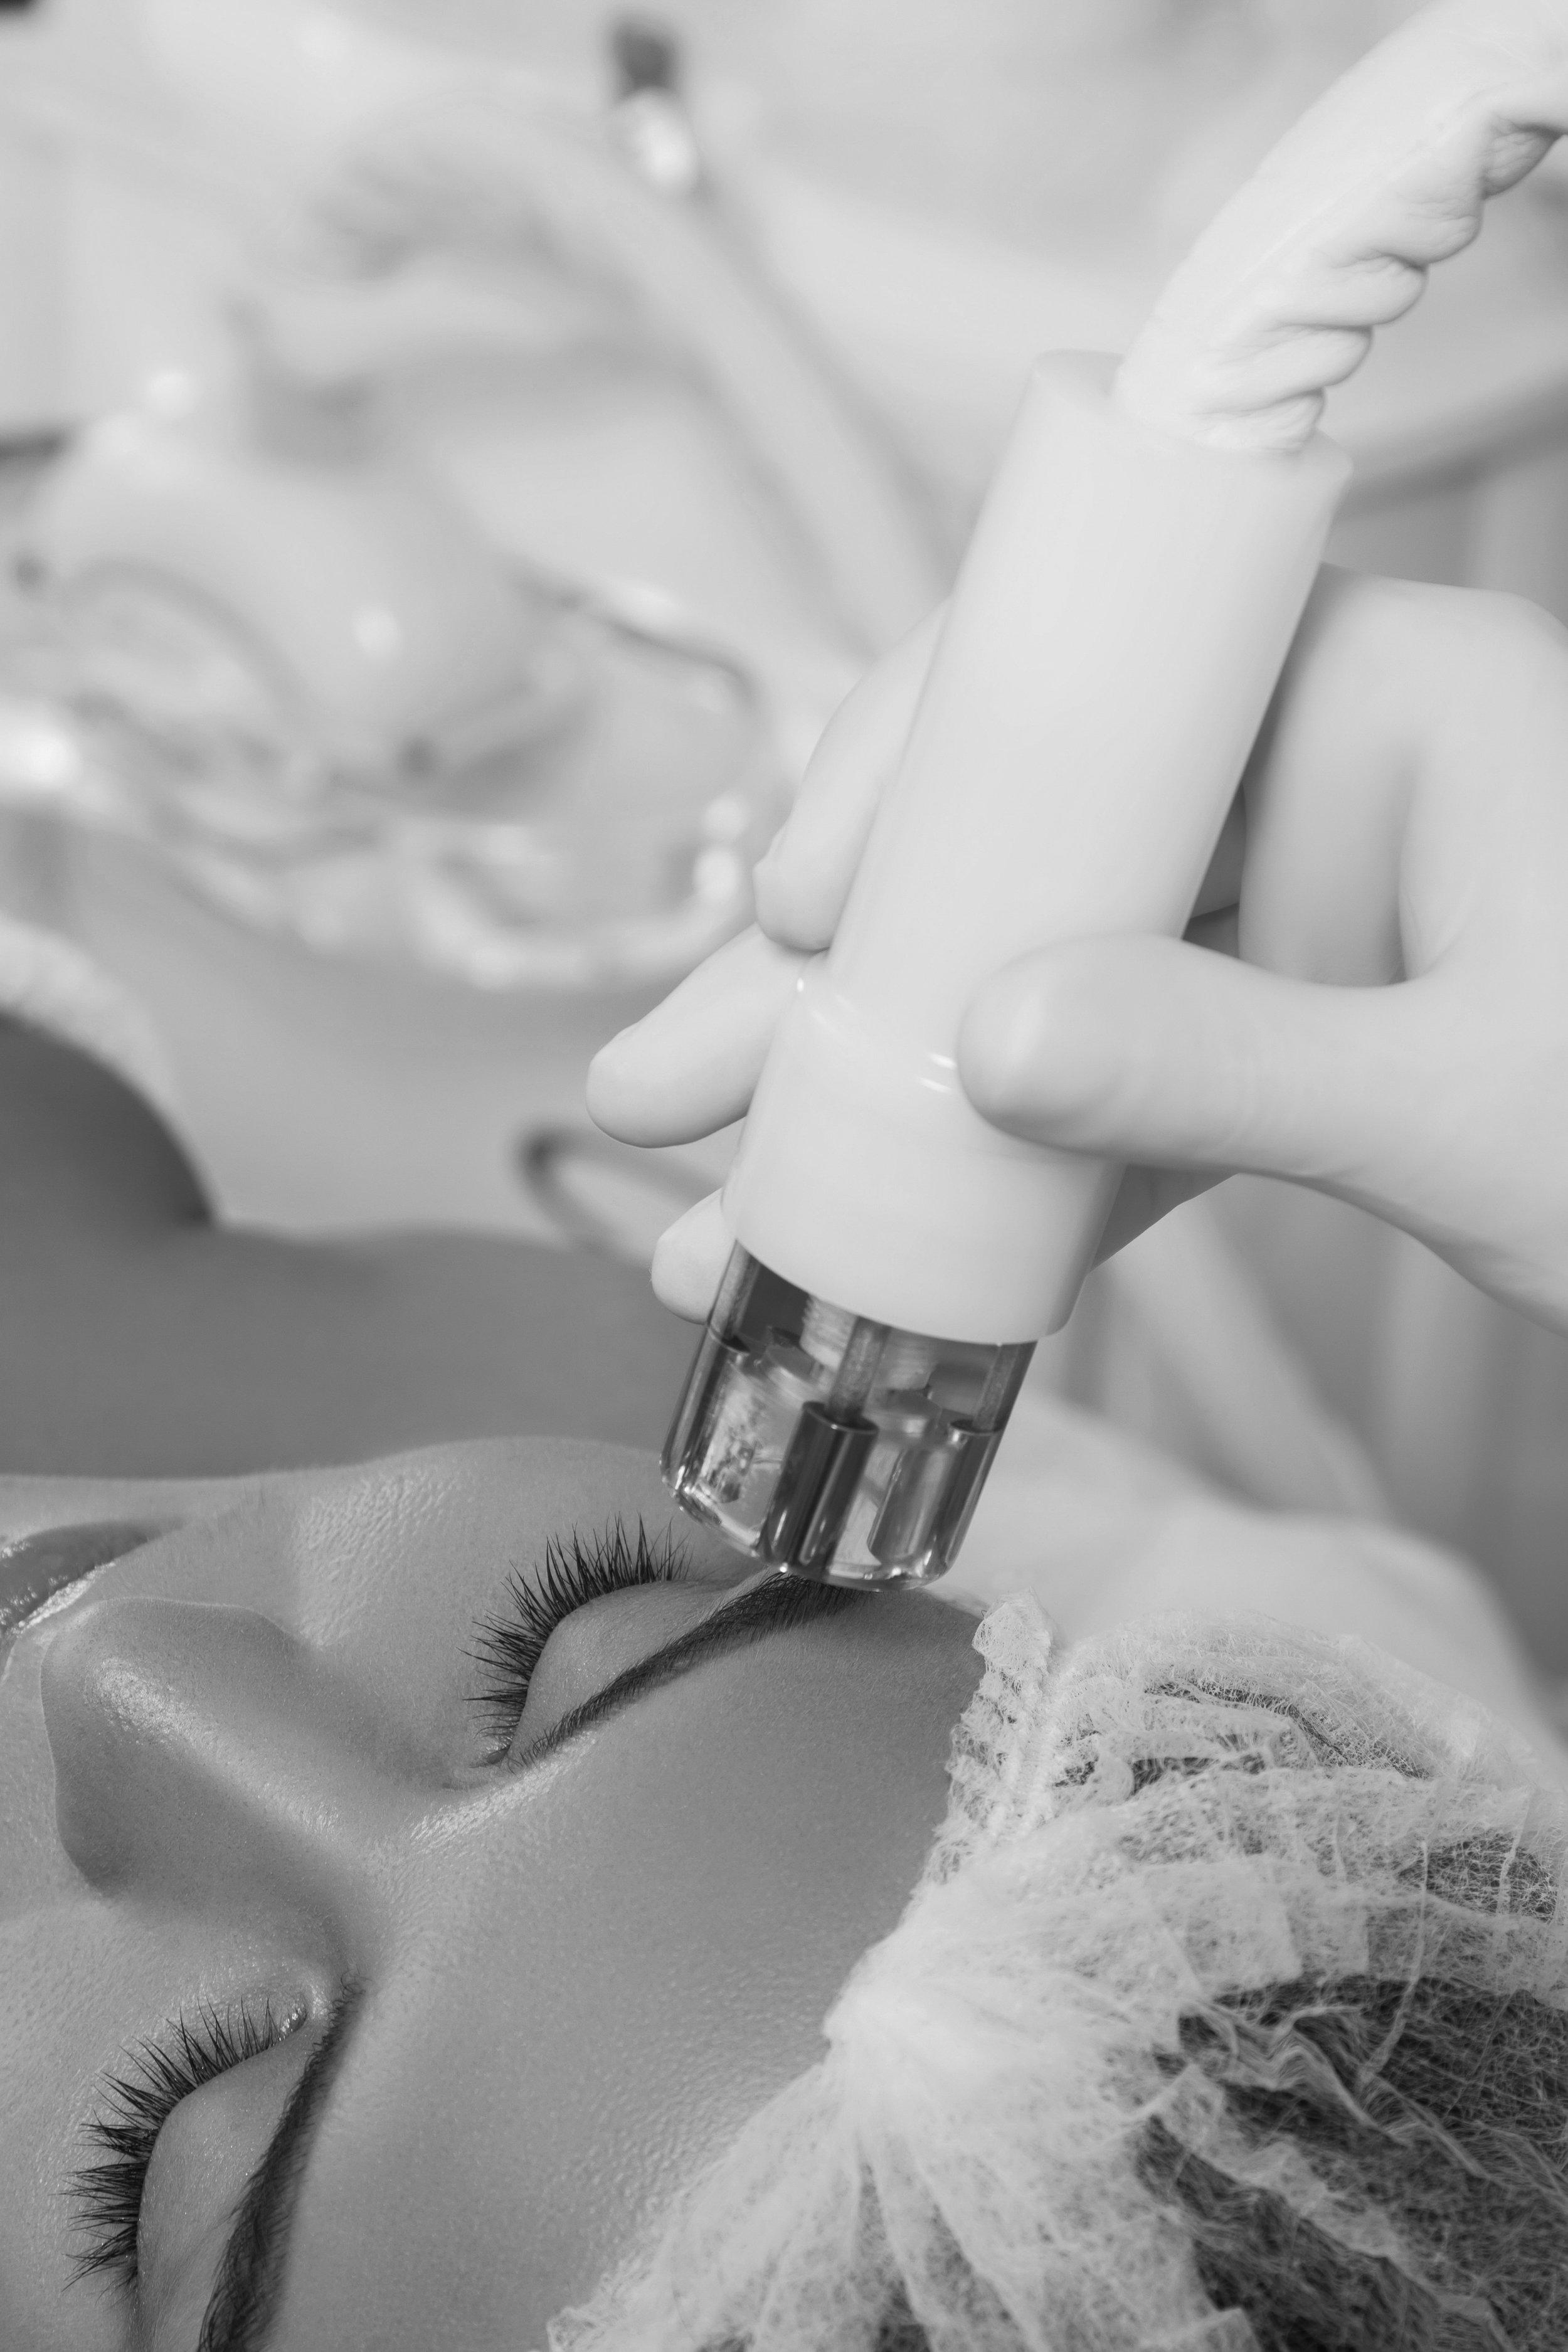 Beautiful_woman_in_professional_beauty_salon_during_rejuvenation_procedure_ 2.JPG